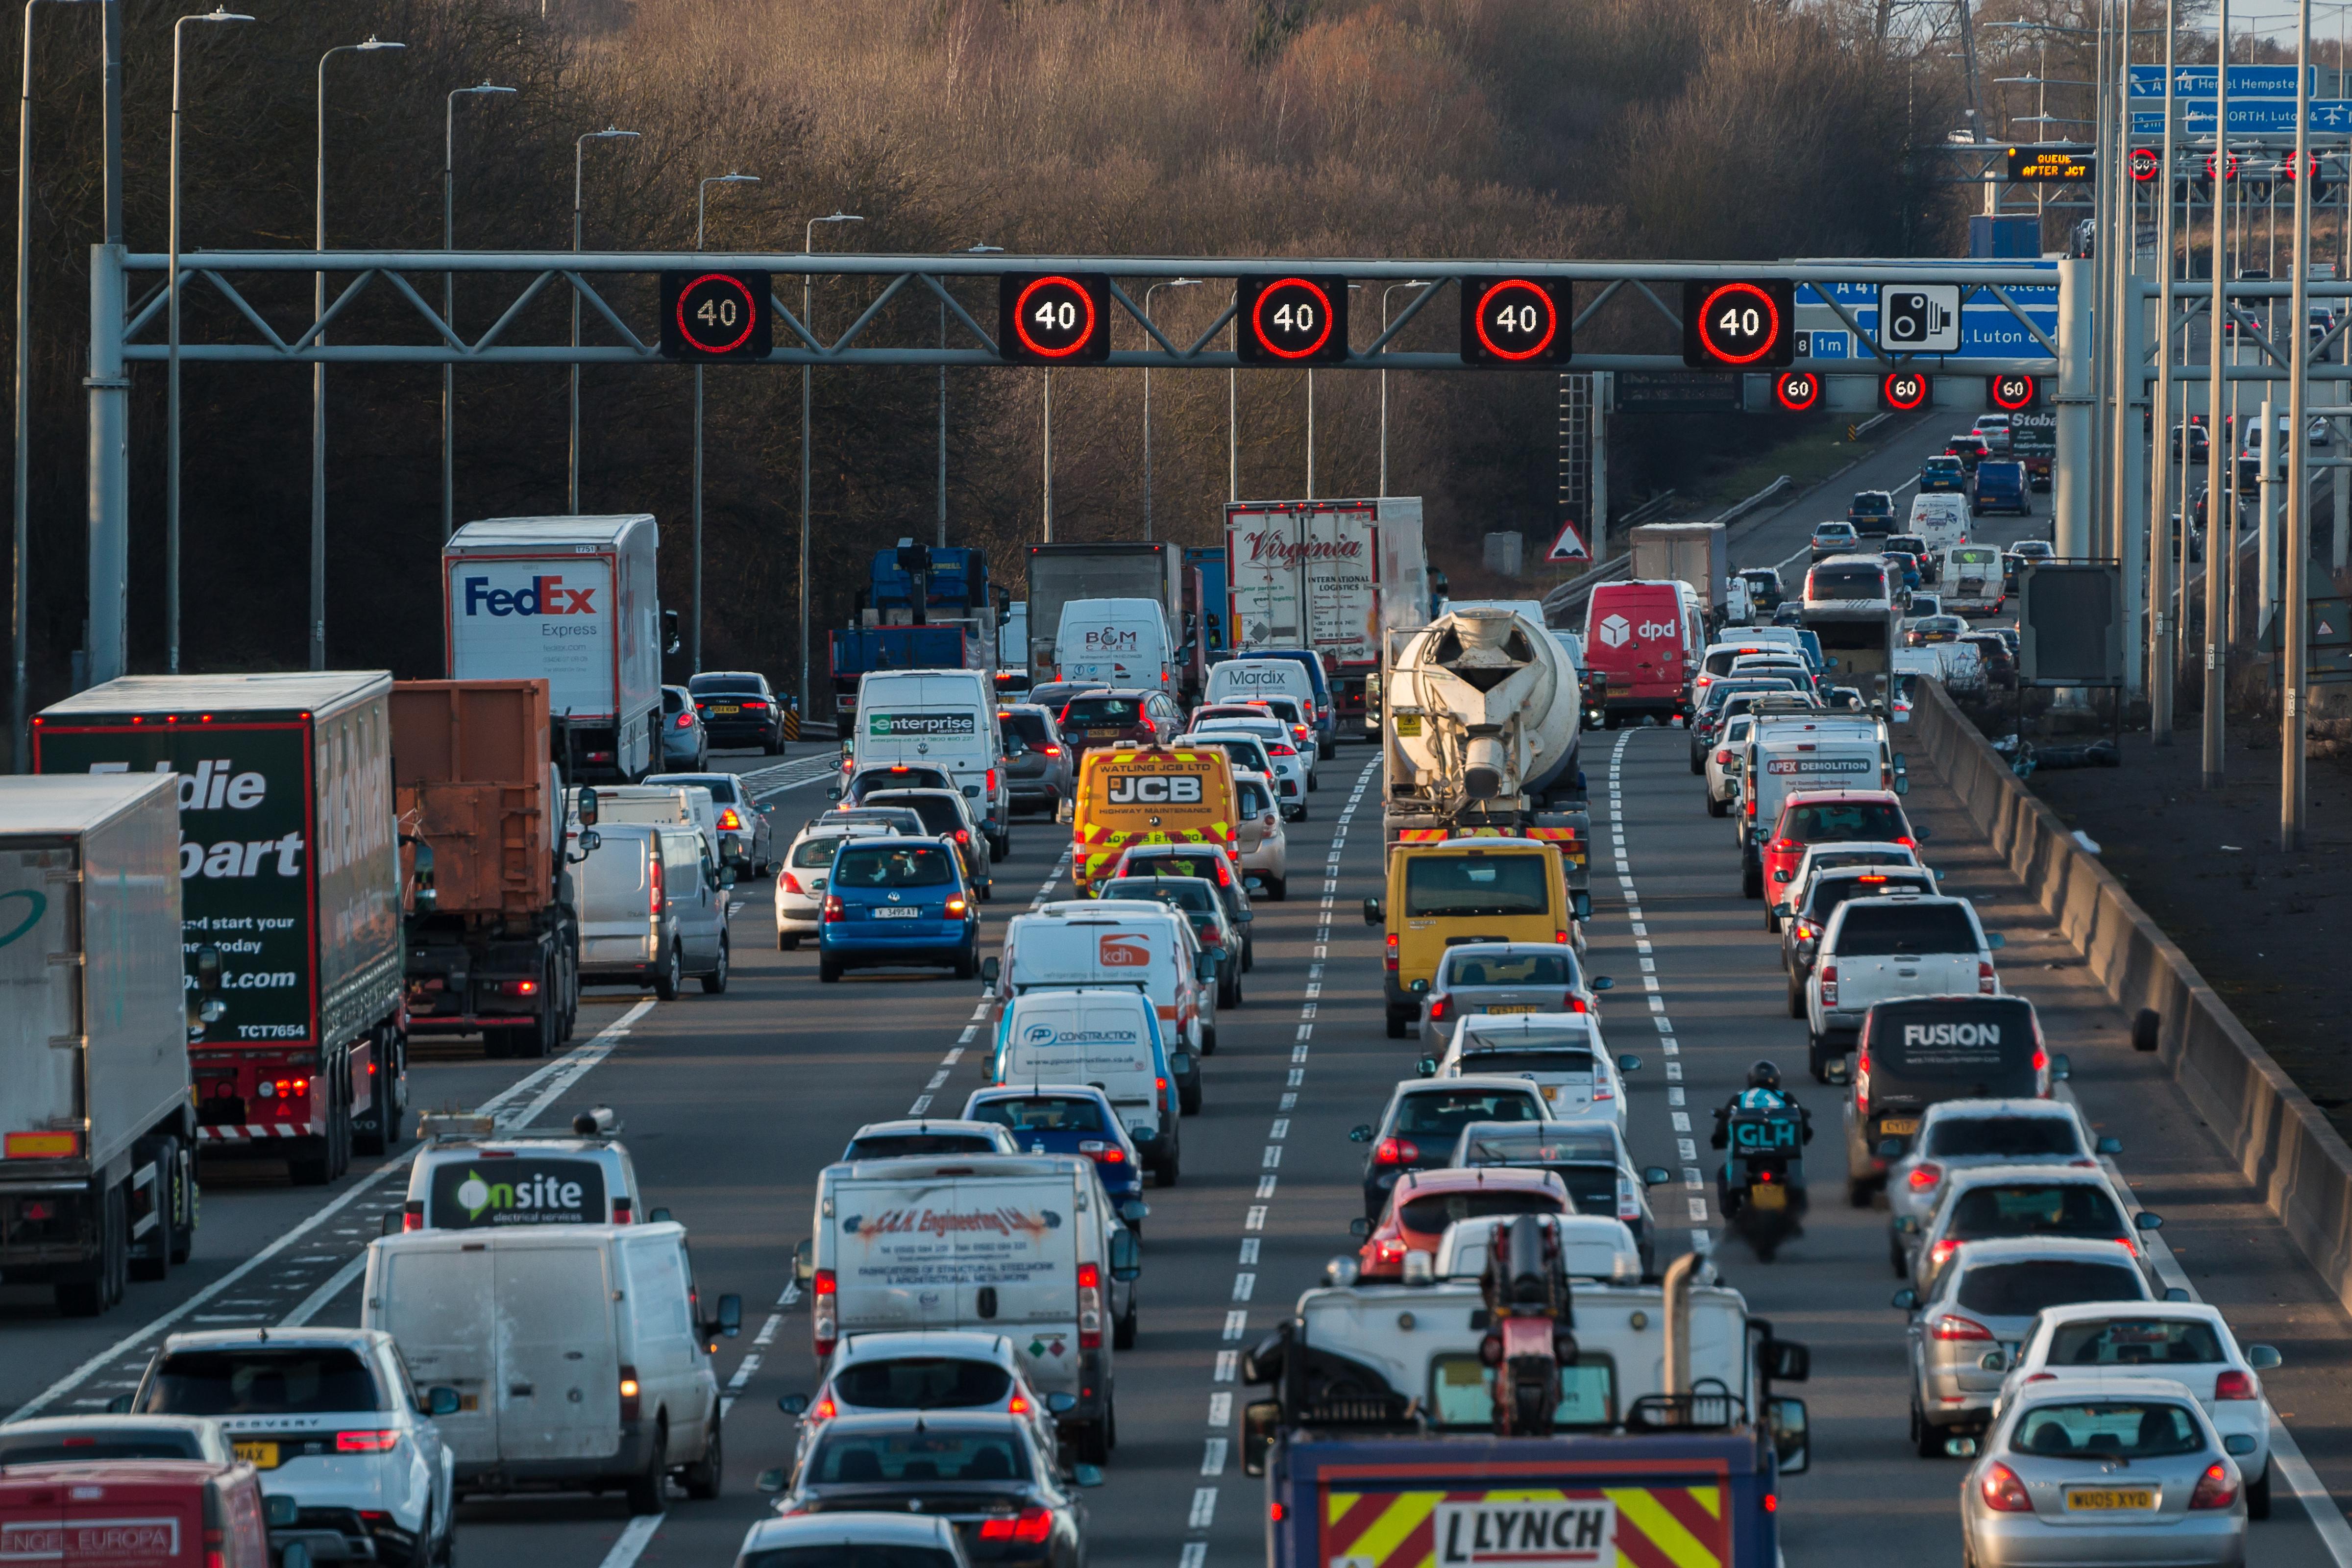 Traffic in Watford